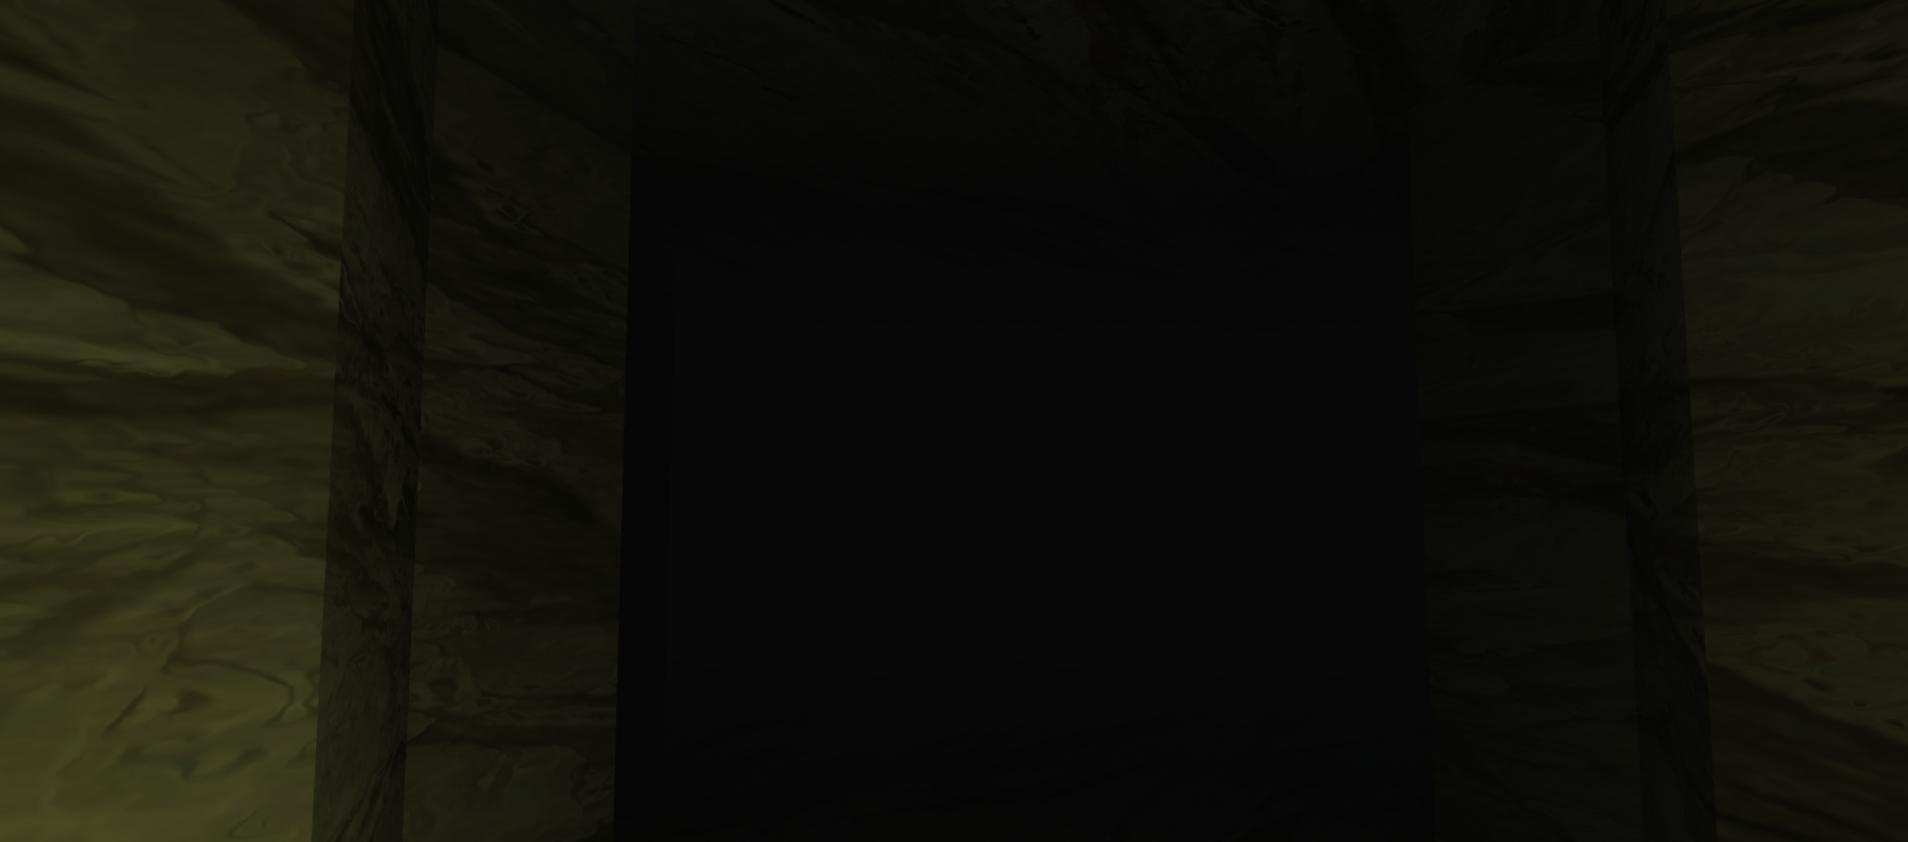 Procedural Dungeon Generator